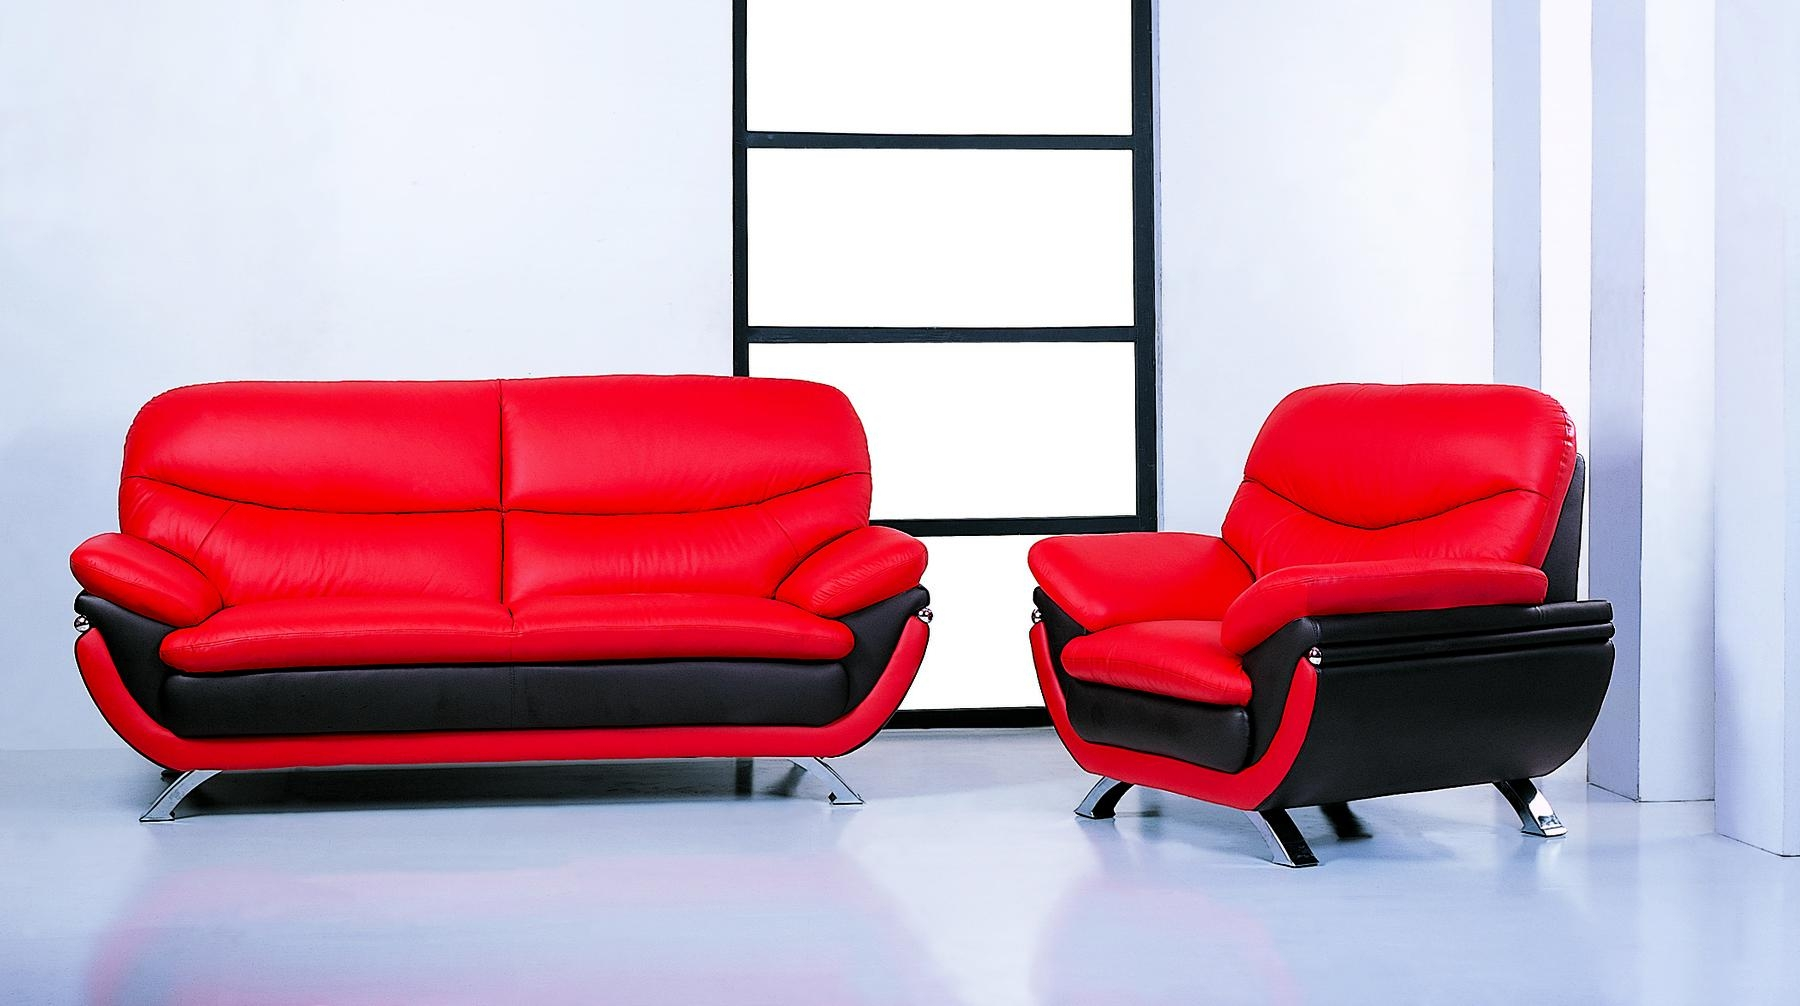 Jonus Red/black Sofa Jonus Beverly Hills Furniture Leather Sofas in Black And Red Sofa Sets